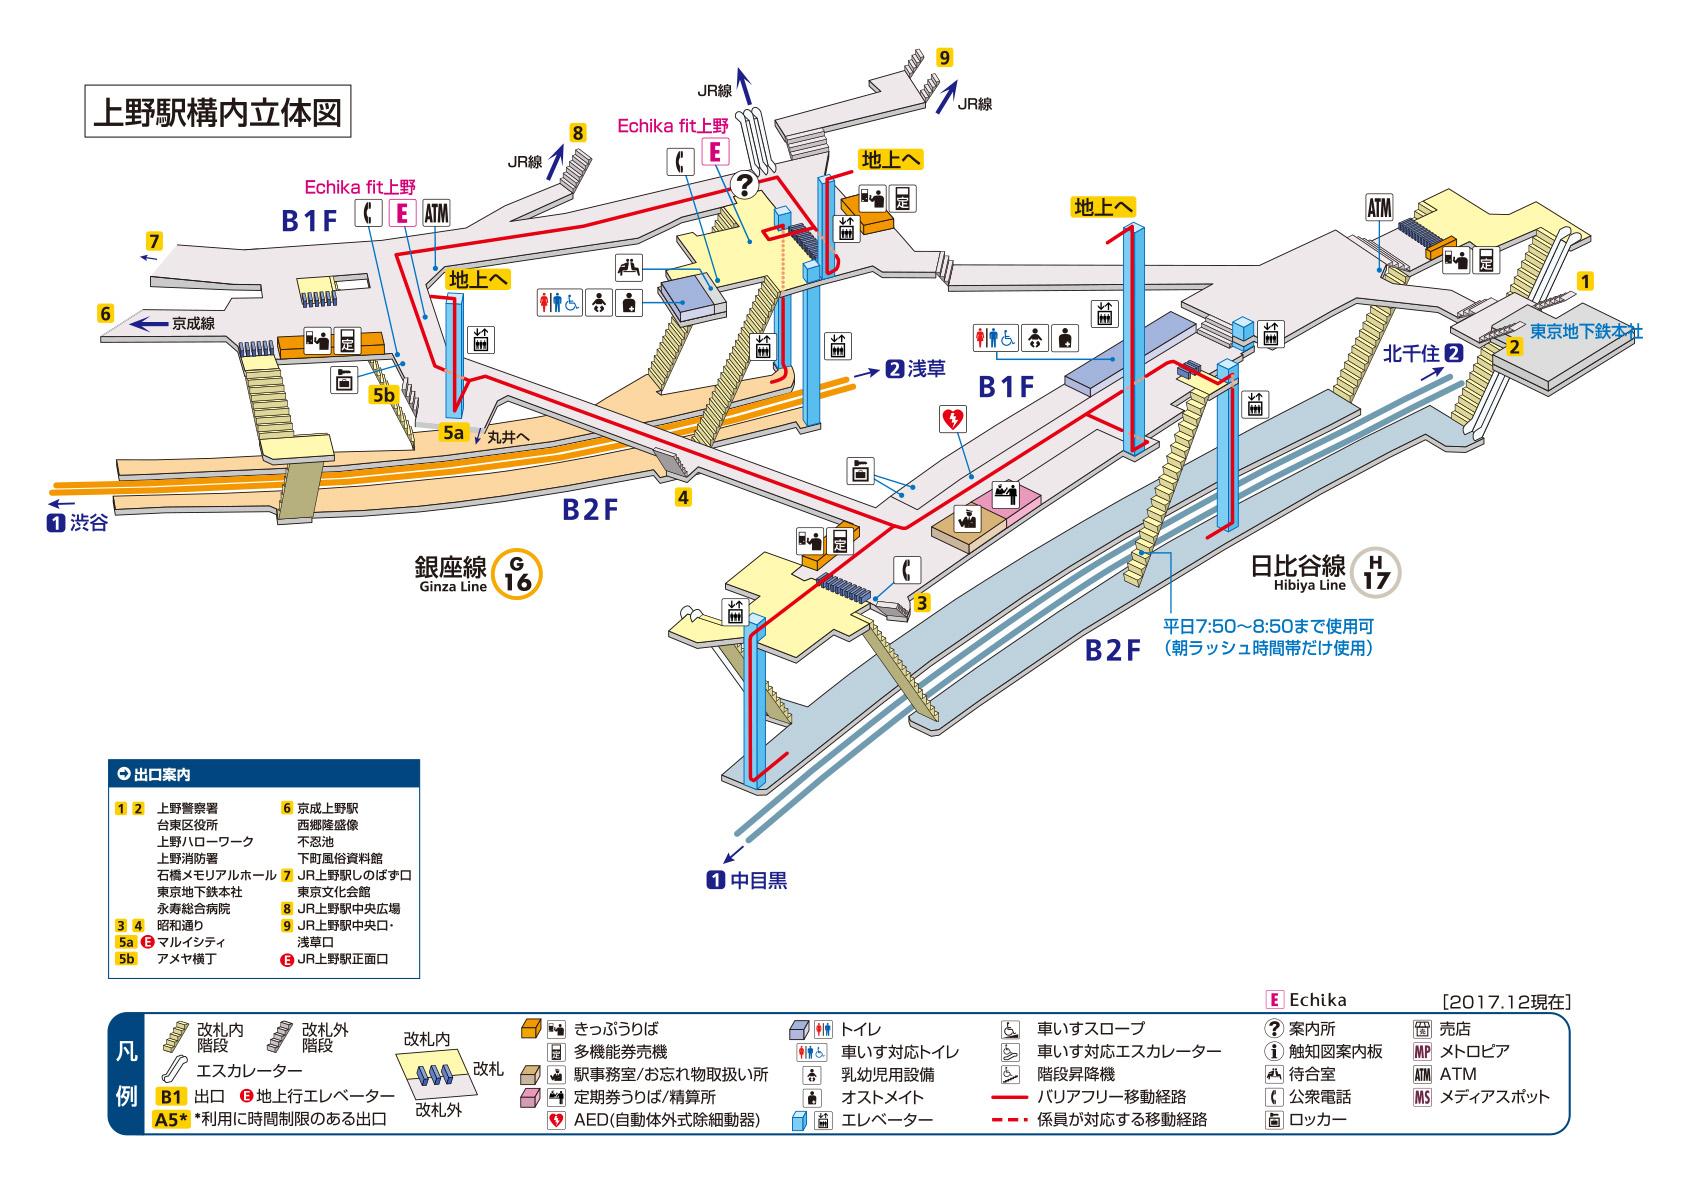 Tokyo Dome Hotel - TripAdvisor